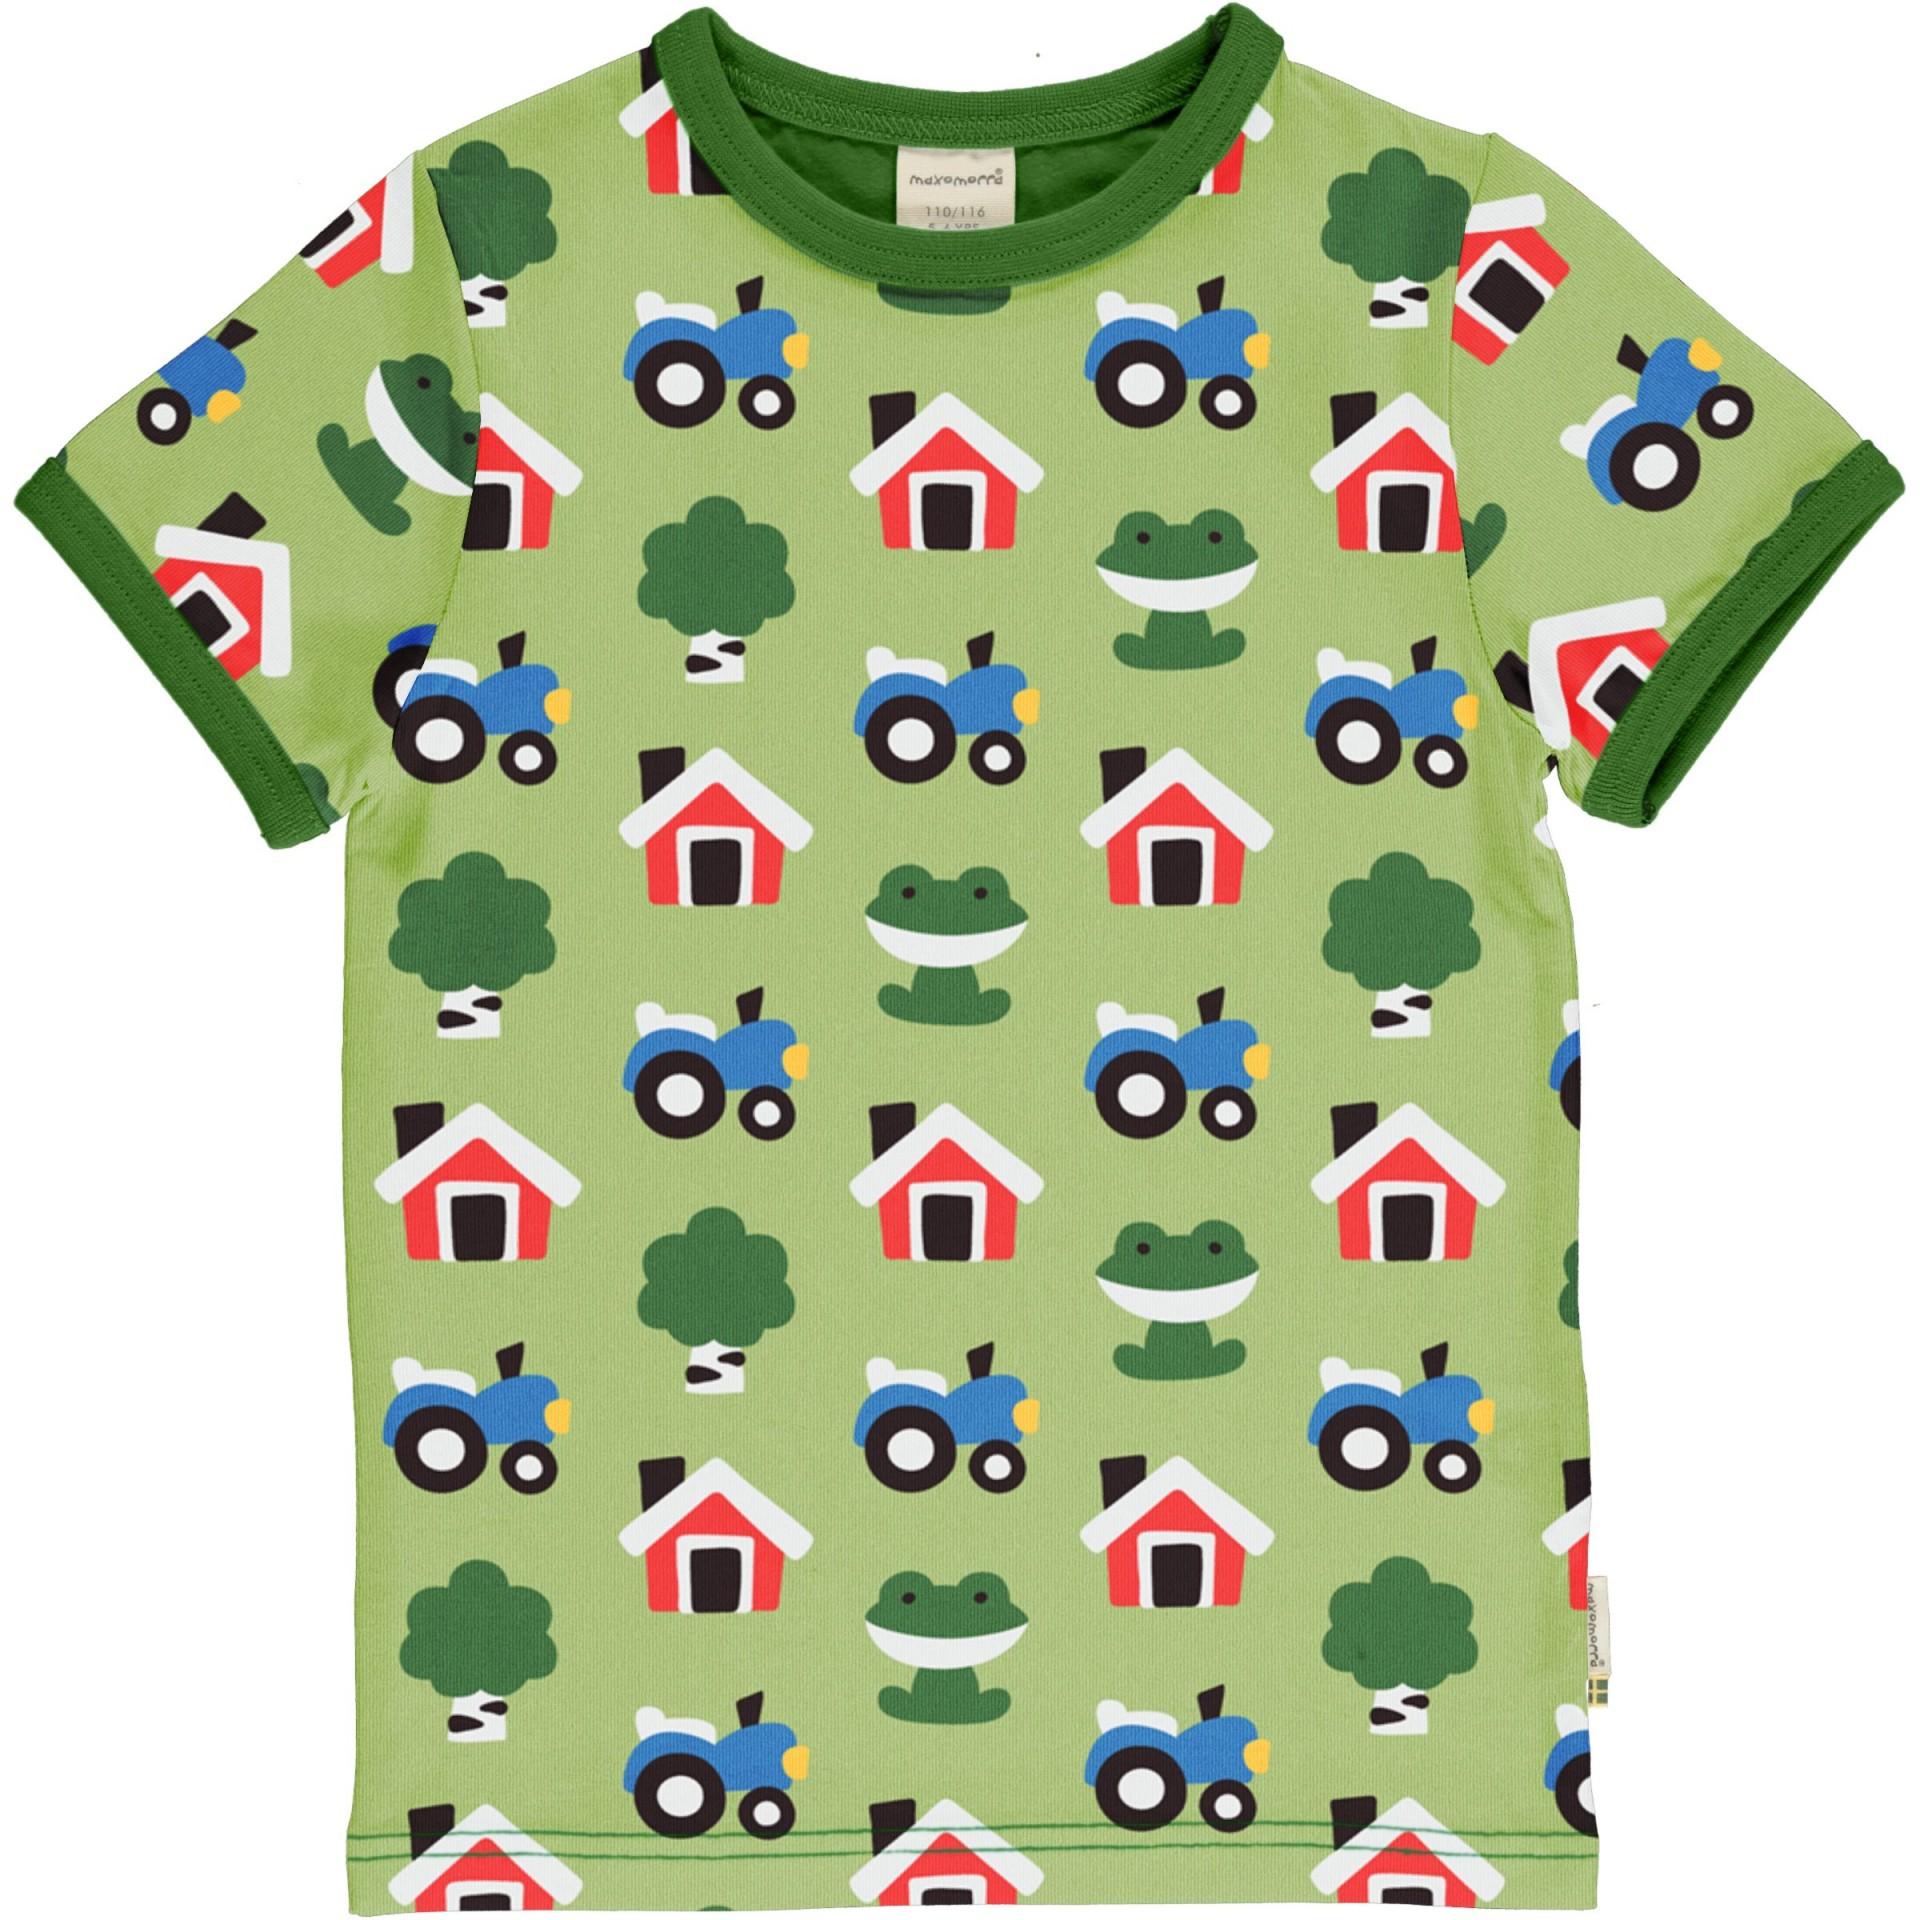 T-shirt FOREST FARM Maxomorra (Tamanhos disponíveis 9-12m, 18-24m)